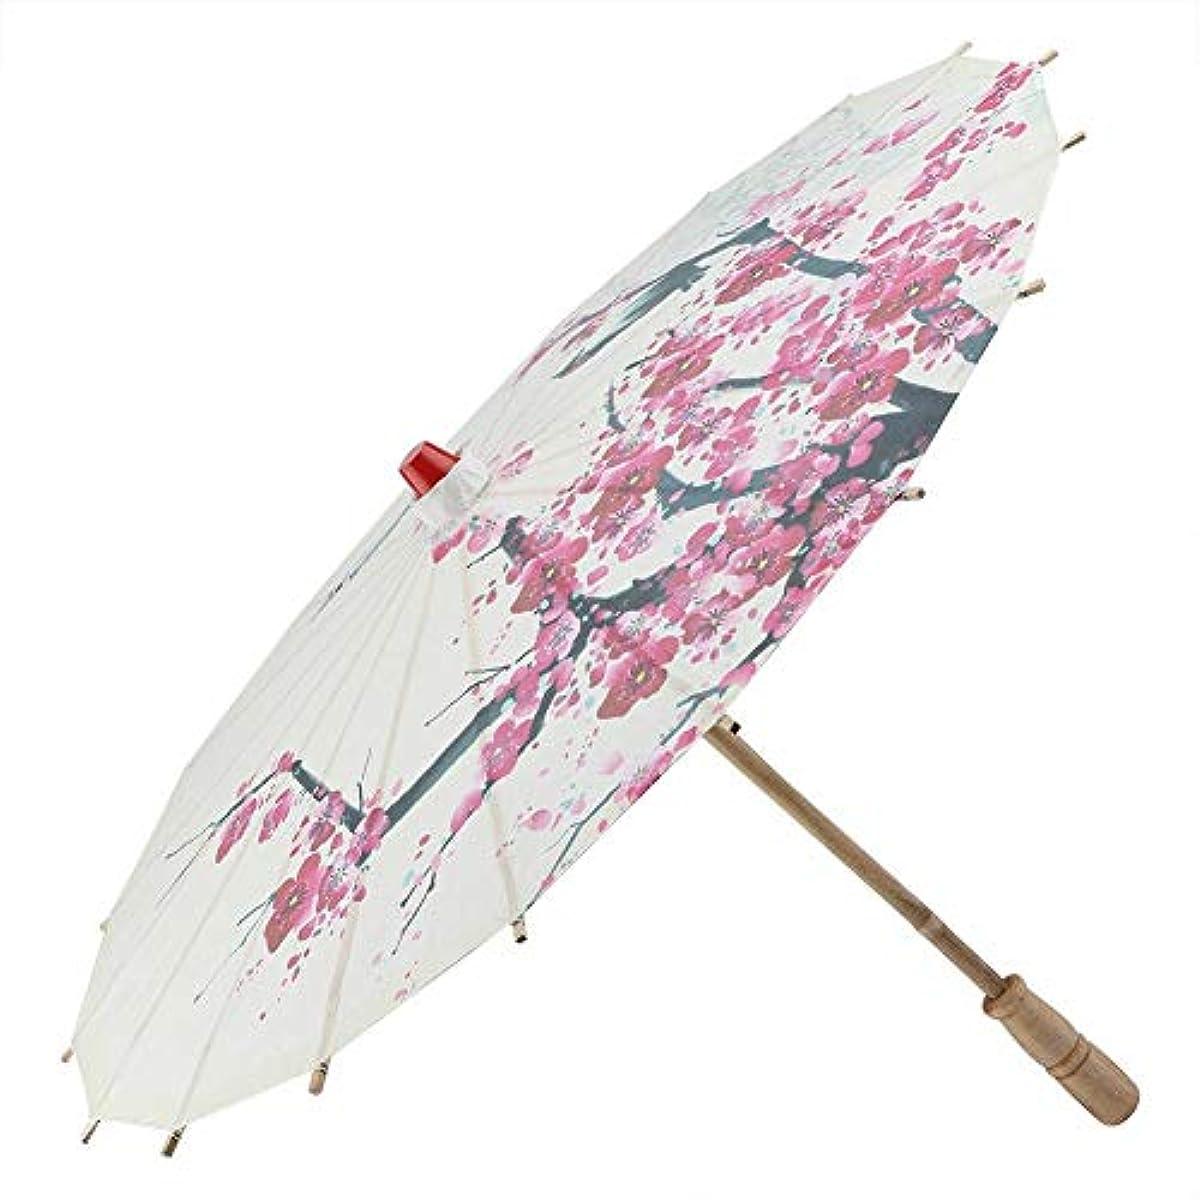 DIY Paper Umbrellas, Classical Handmade Oil Paper Umbrella Painting Dancing Props Rainproof Parasol with Plum Blossoms & Wooden Handle